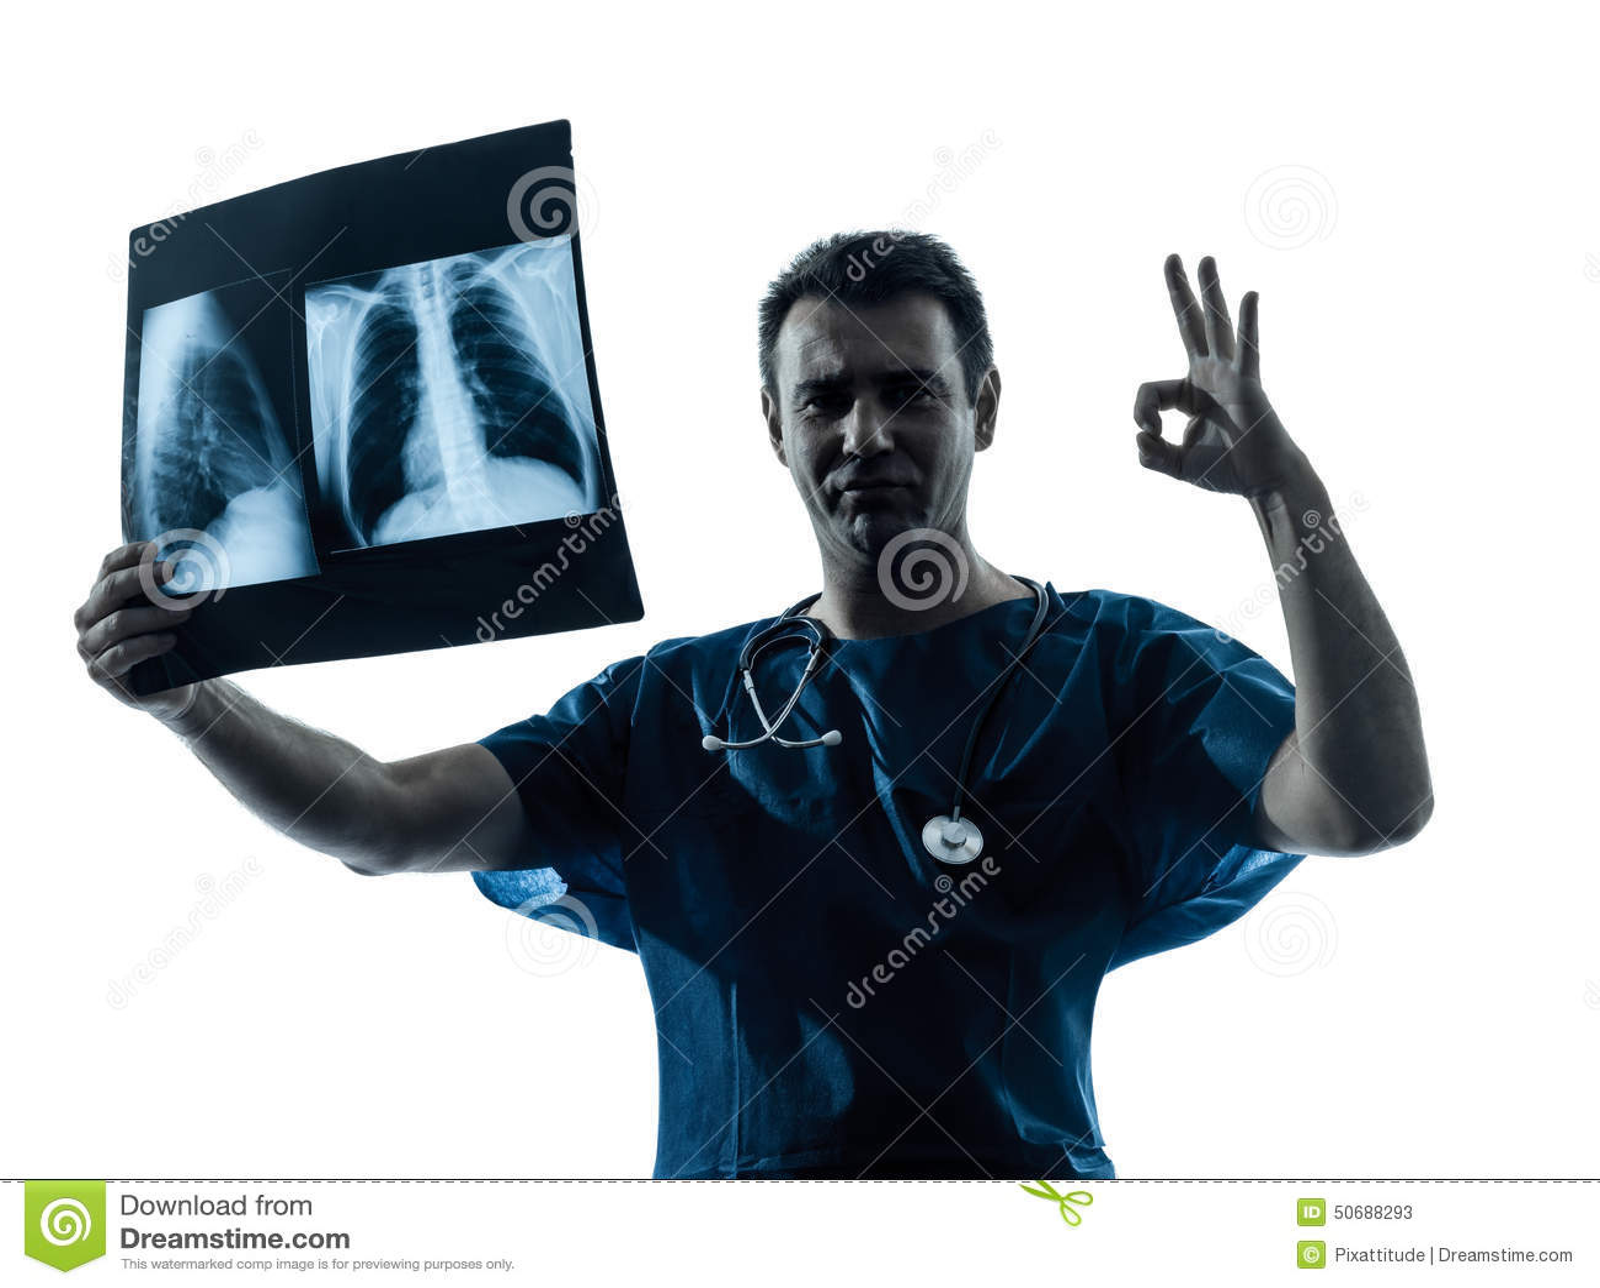 Download 医治打手势好审查的肺躯干的外科医生放射学家 库存图片. 图片 包括有 检查, 外科医生, 剪影, 关心, 纵向 - 50688293